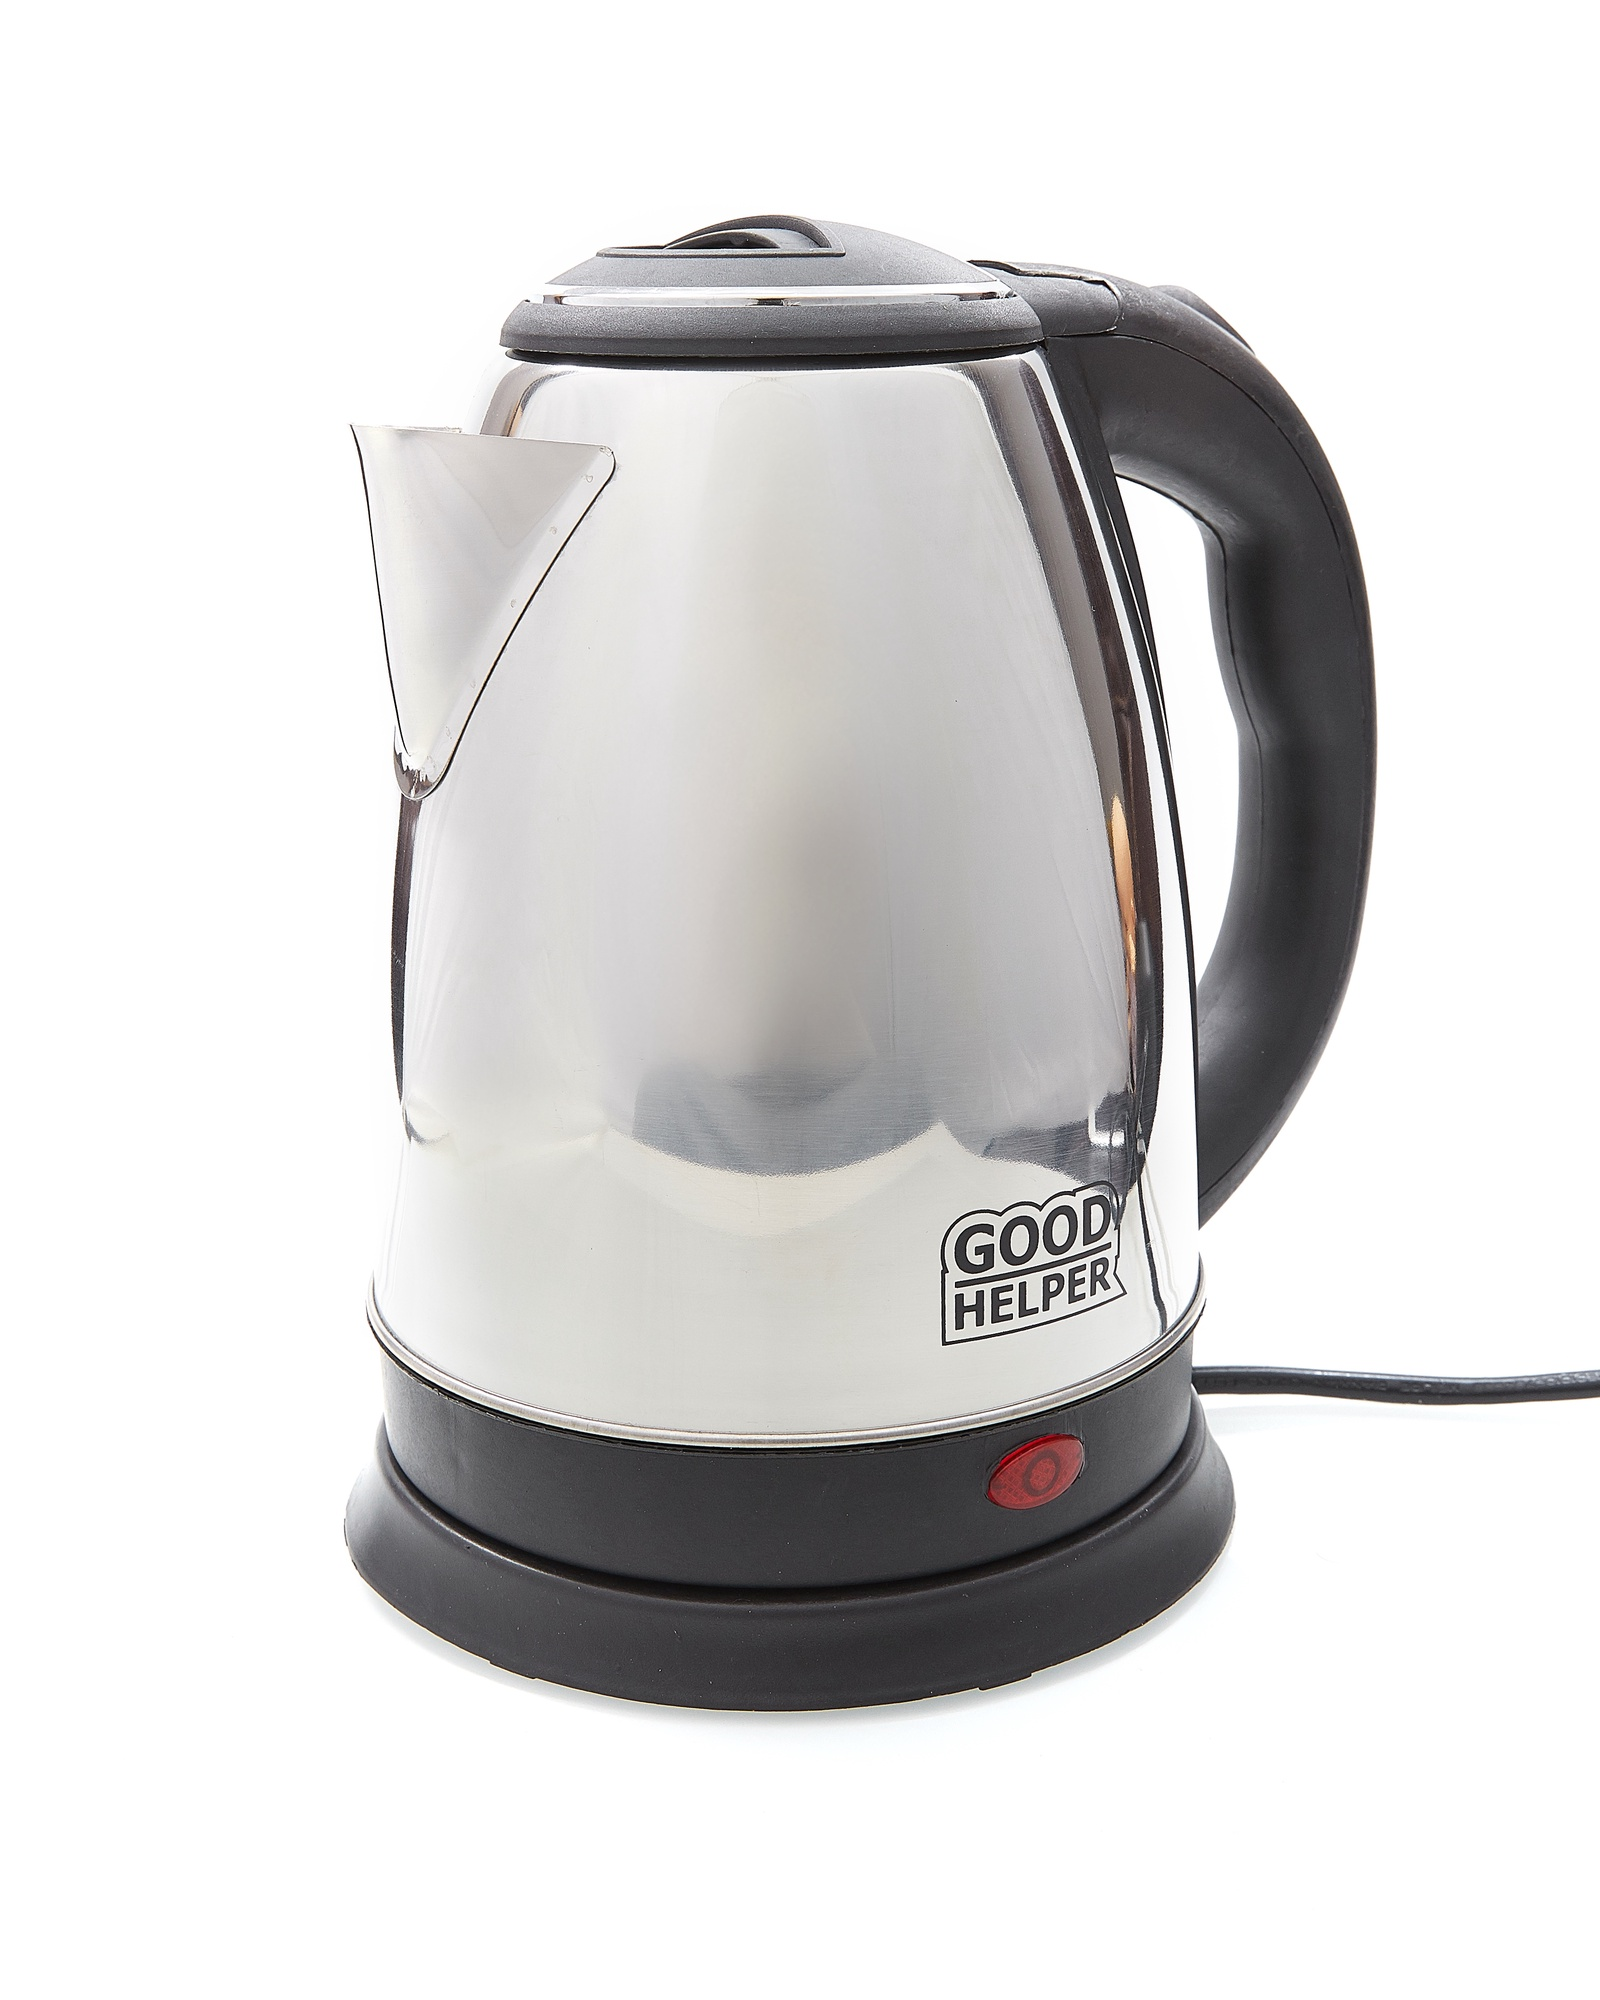 Электрический чайник GOODHELPER Чайник электрический GOODHELPER KS-18B02, серый металлик цена и фото